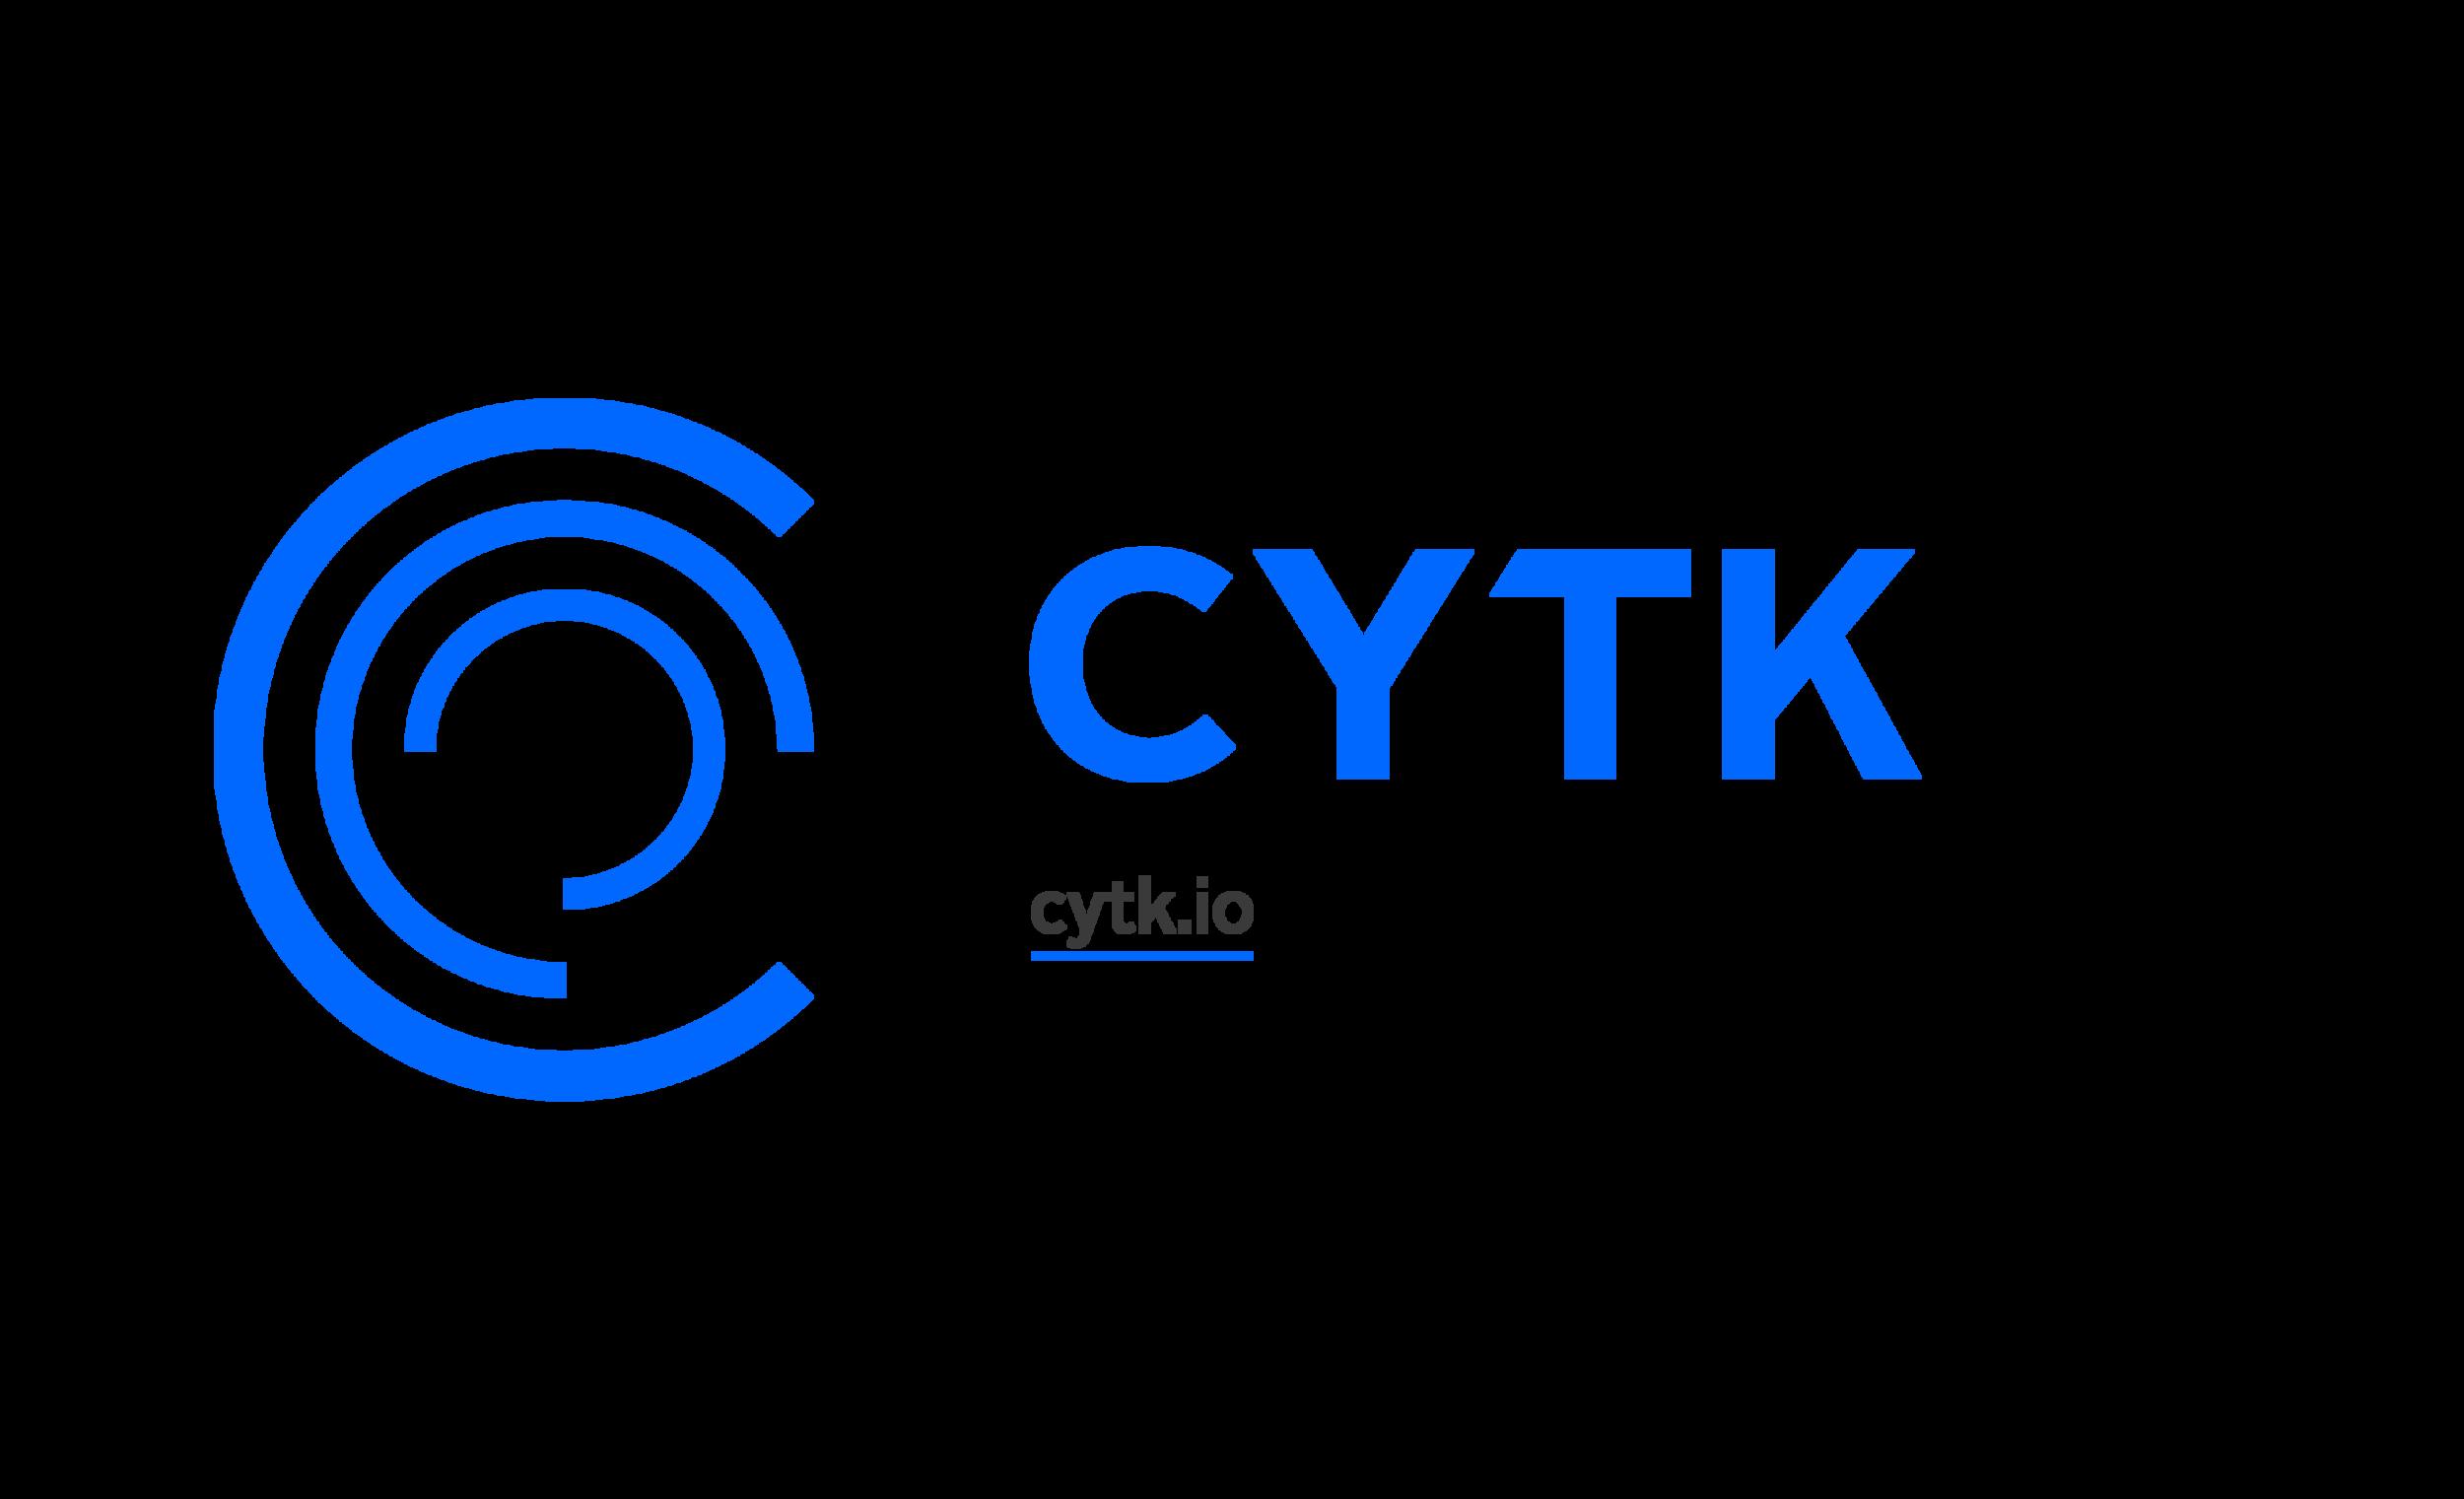 CYTK-Opt2-02B (2).png